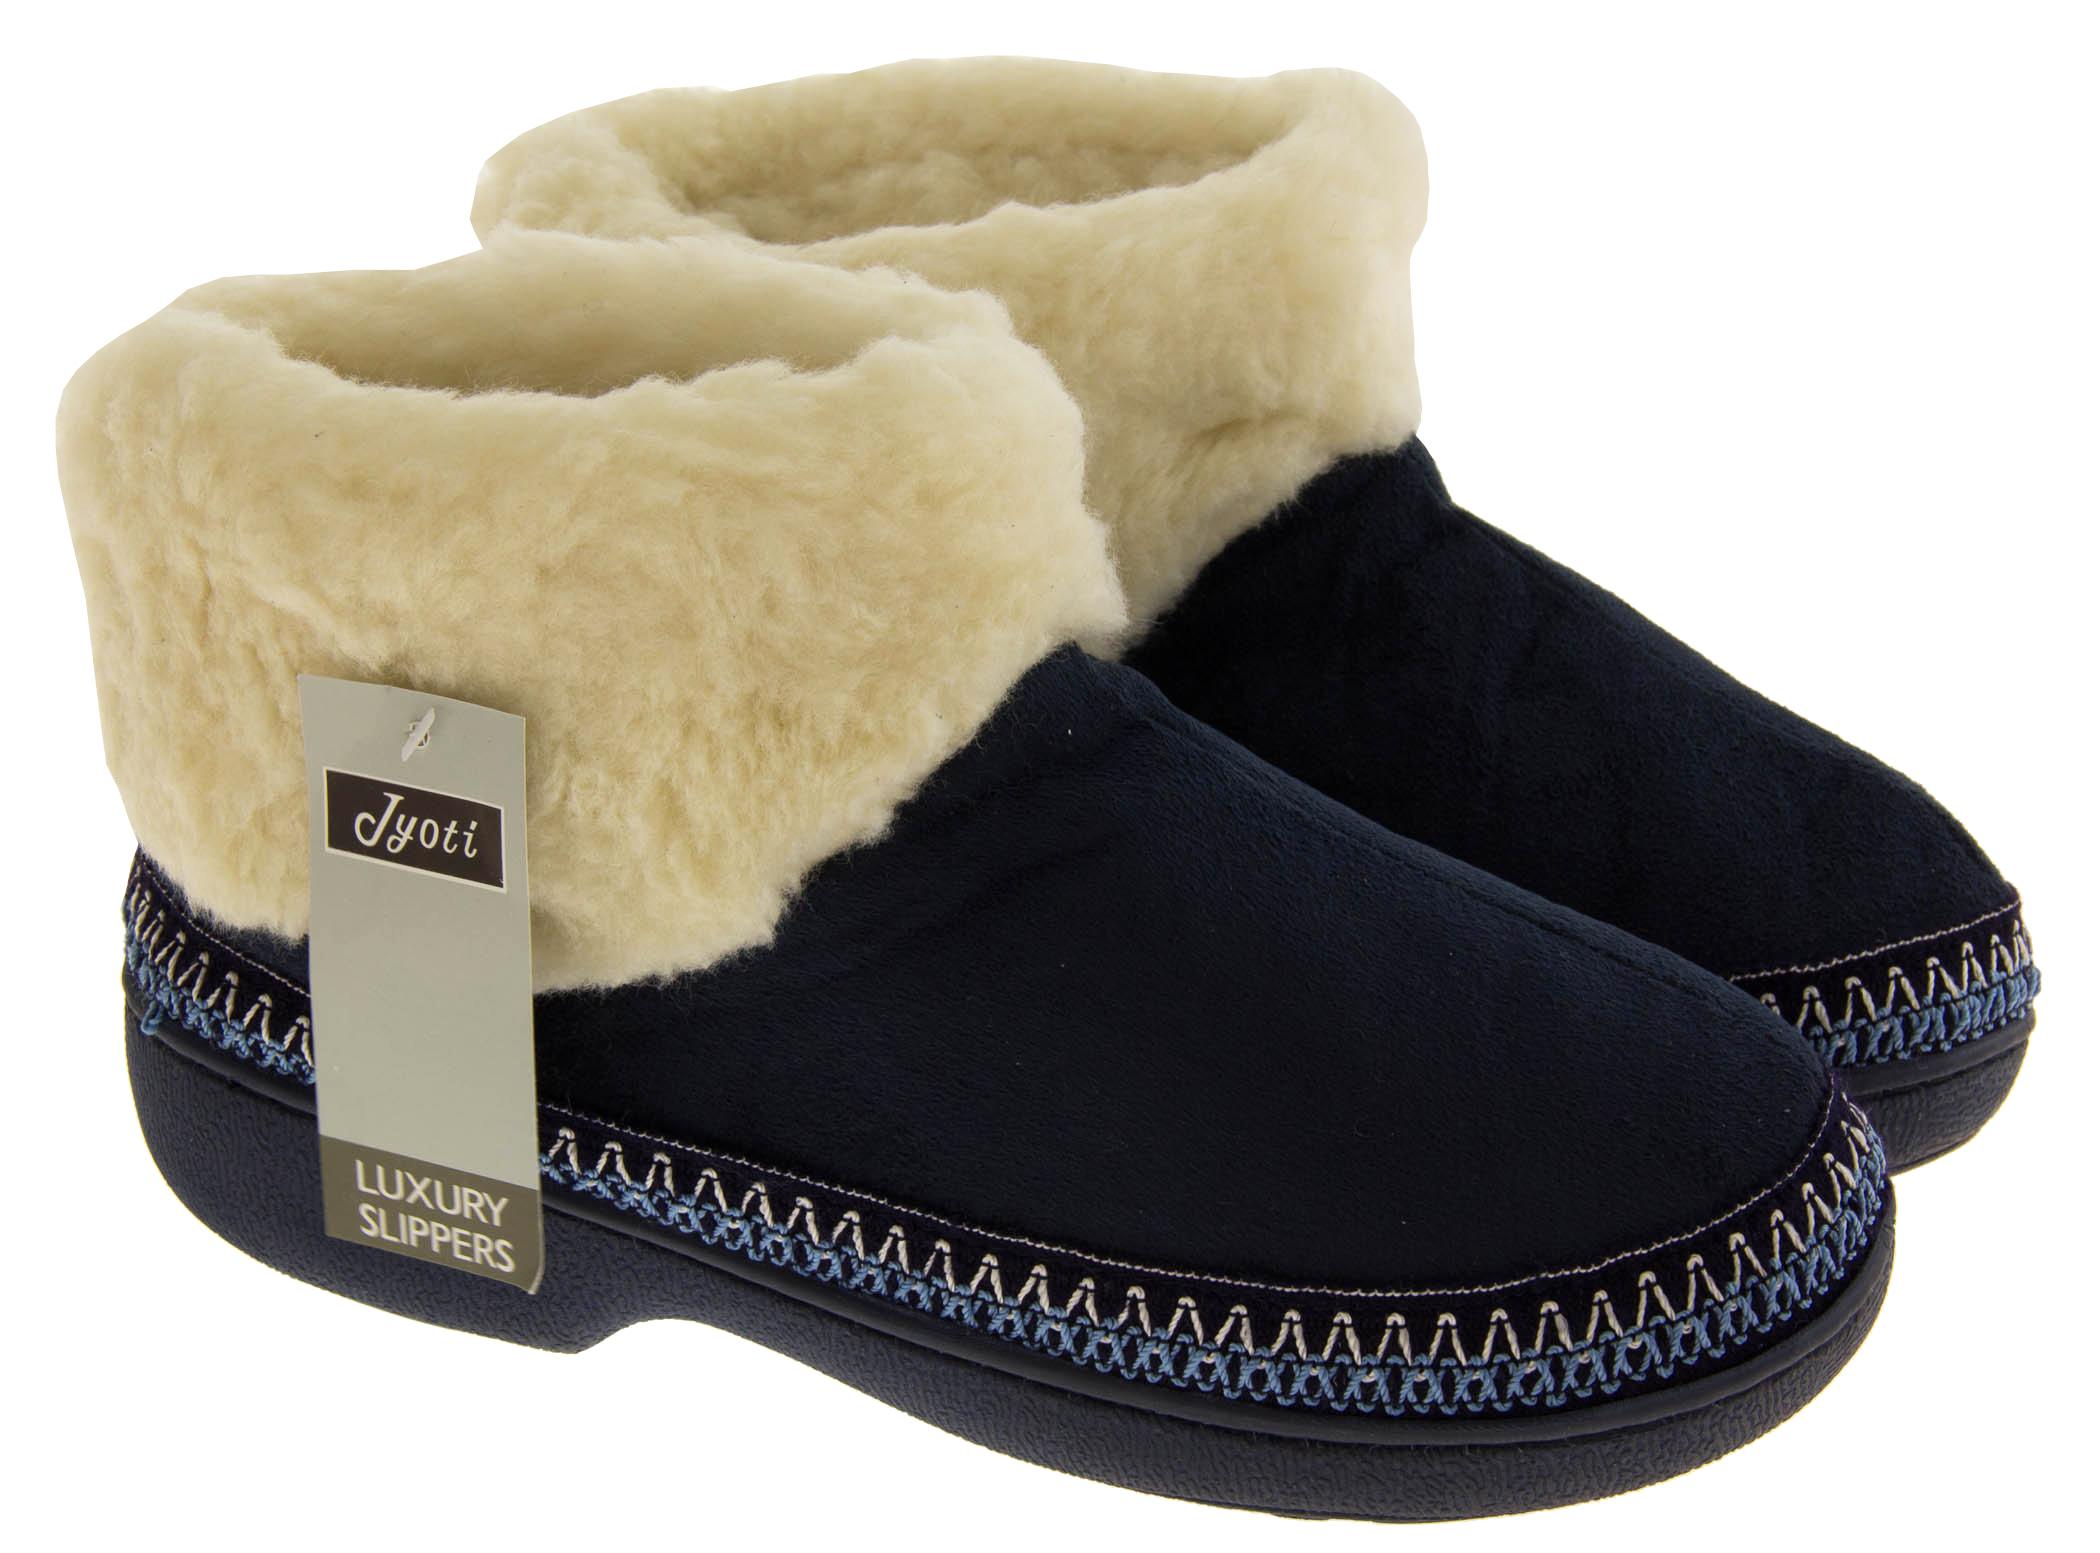 Ladies Womens Flat Ankle Slipper Boots Pom pom Snow Grey Warm Winter Fur Lined 3 4 5 6 7 8